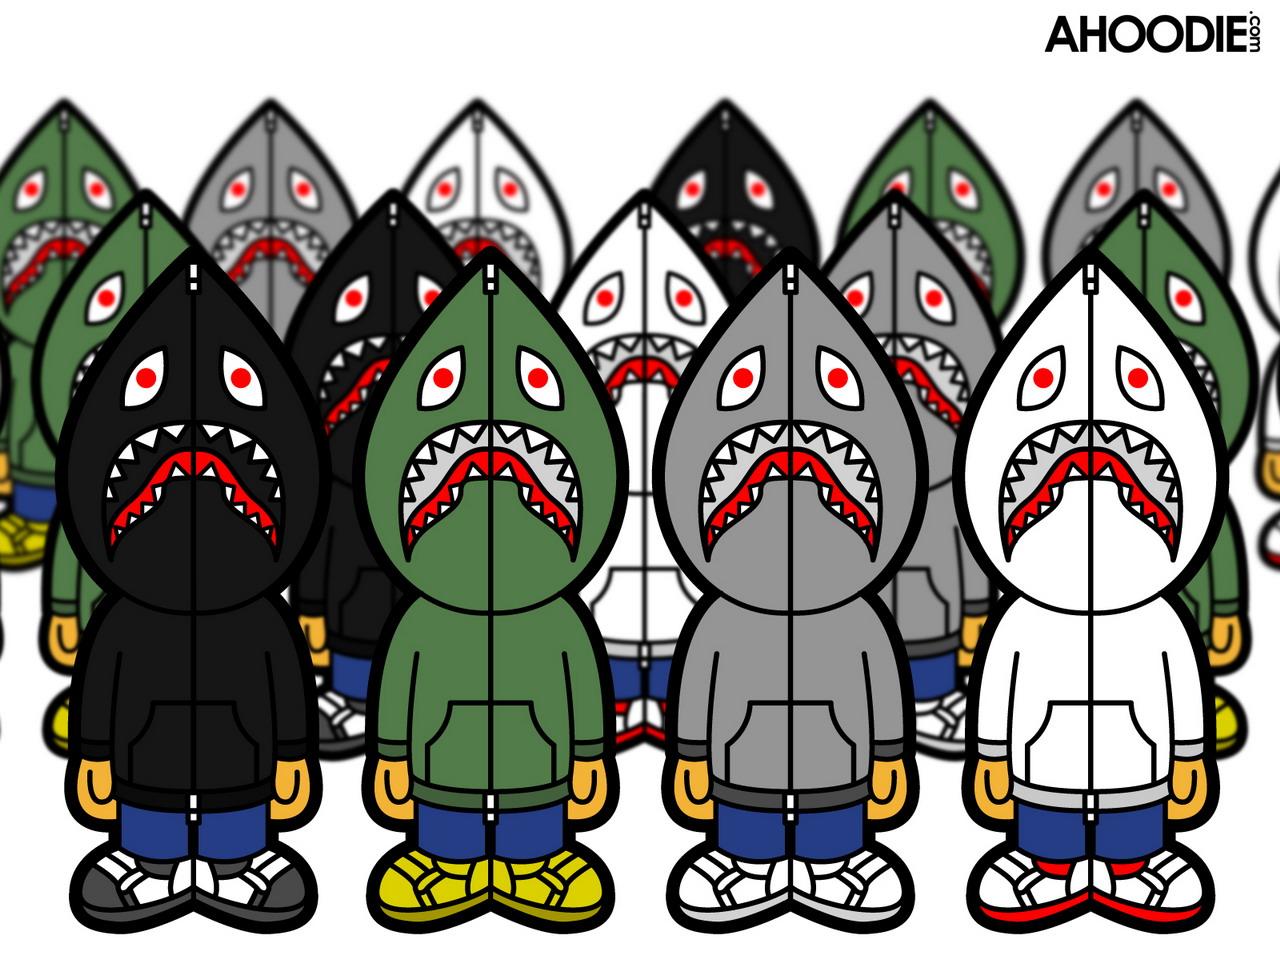 Bape shark hoodie Wallpaper desktop background logo qualityjpg 1280x960